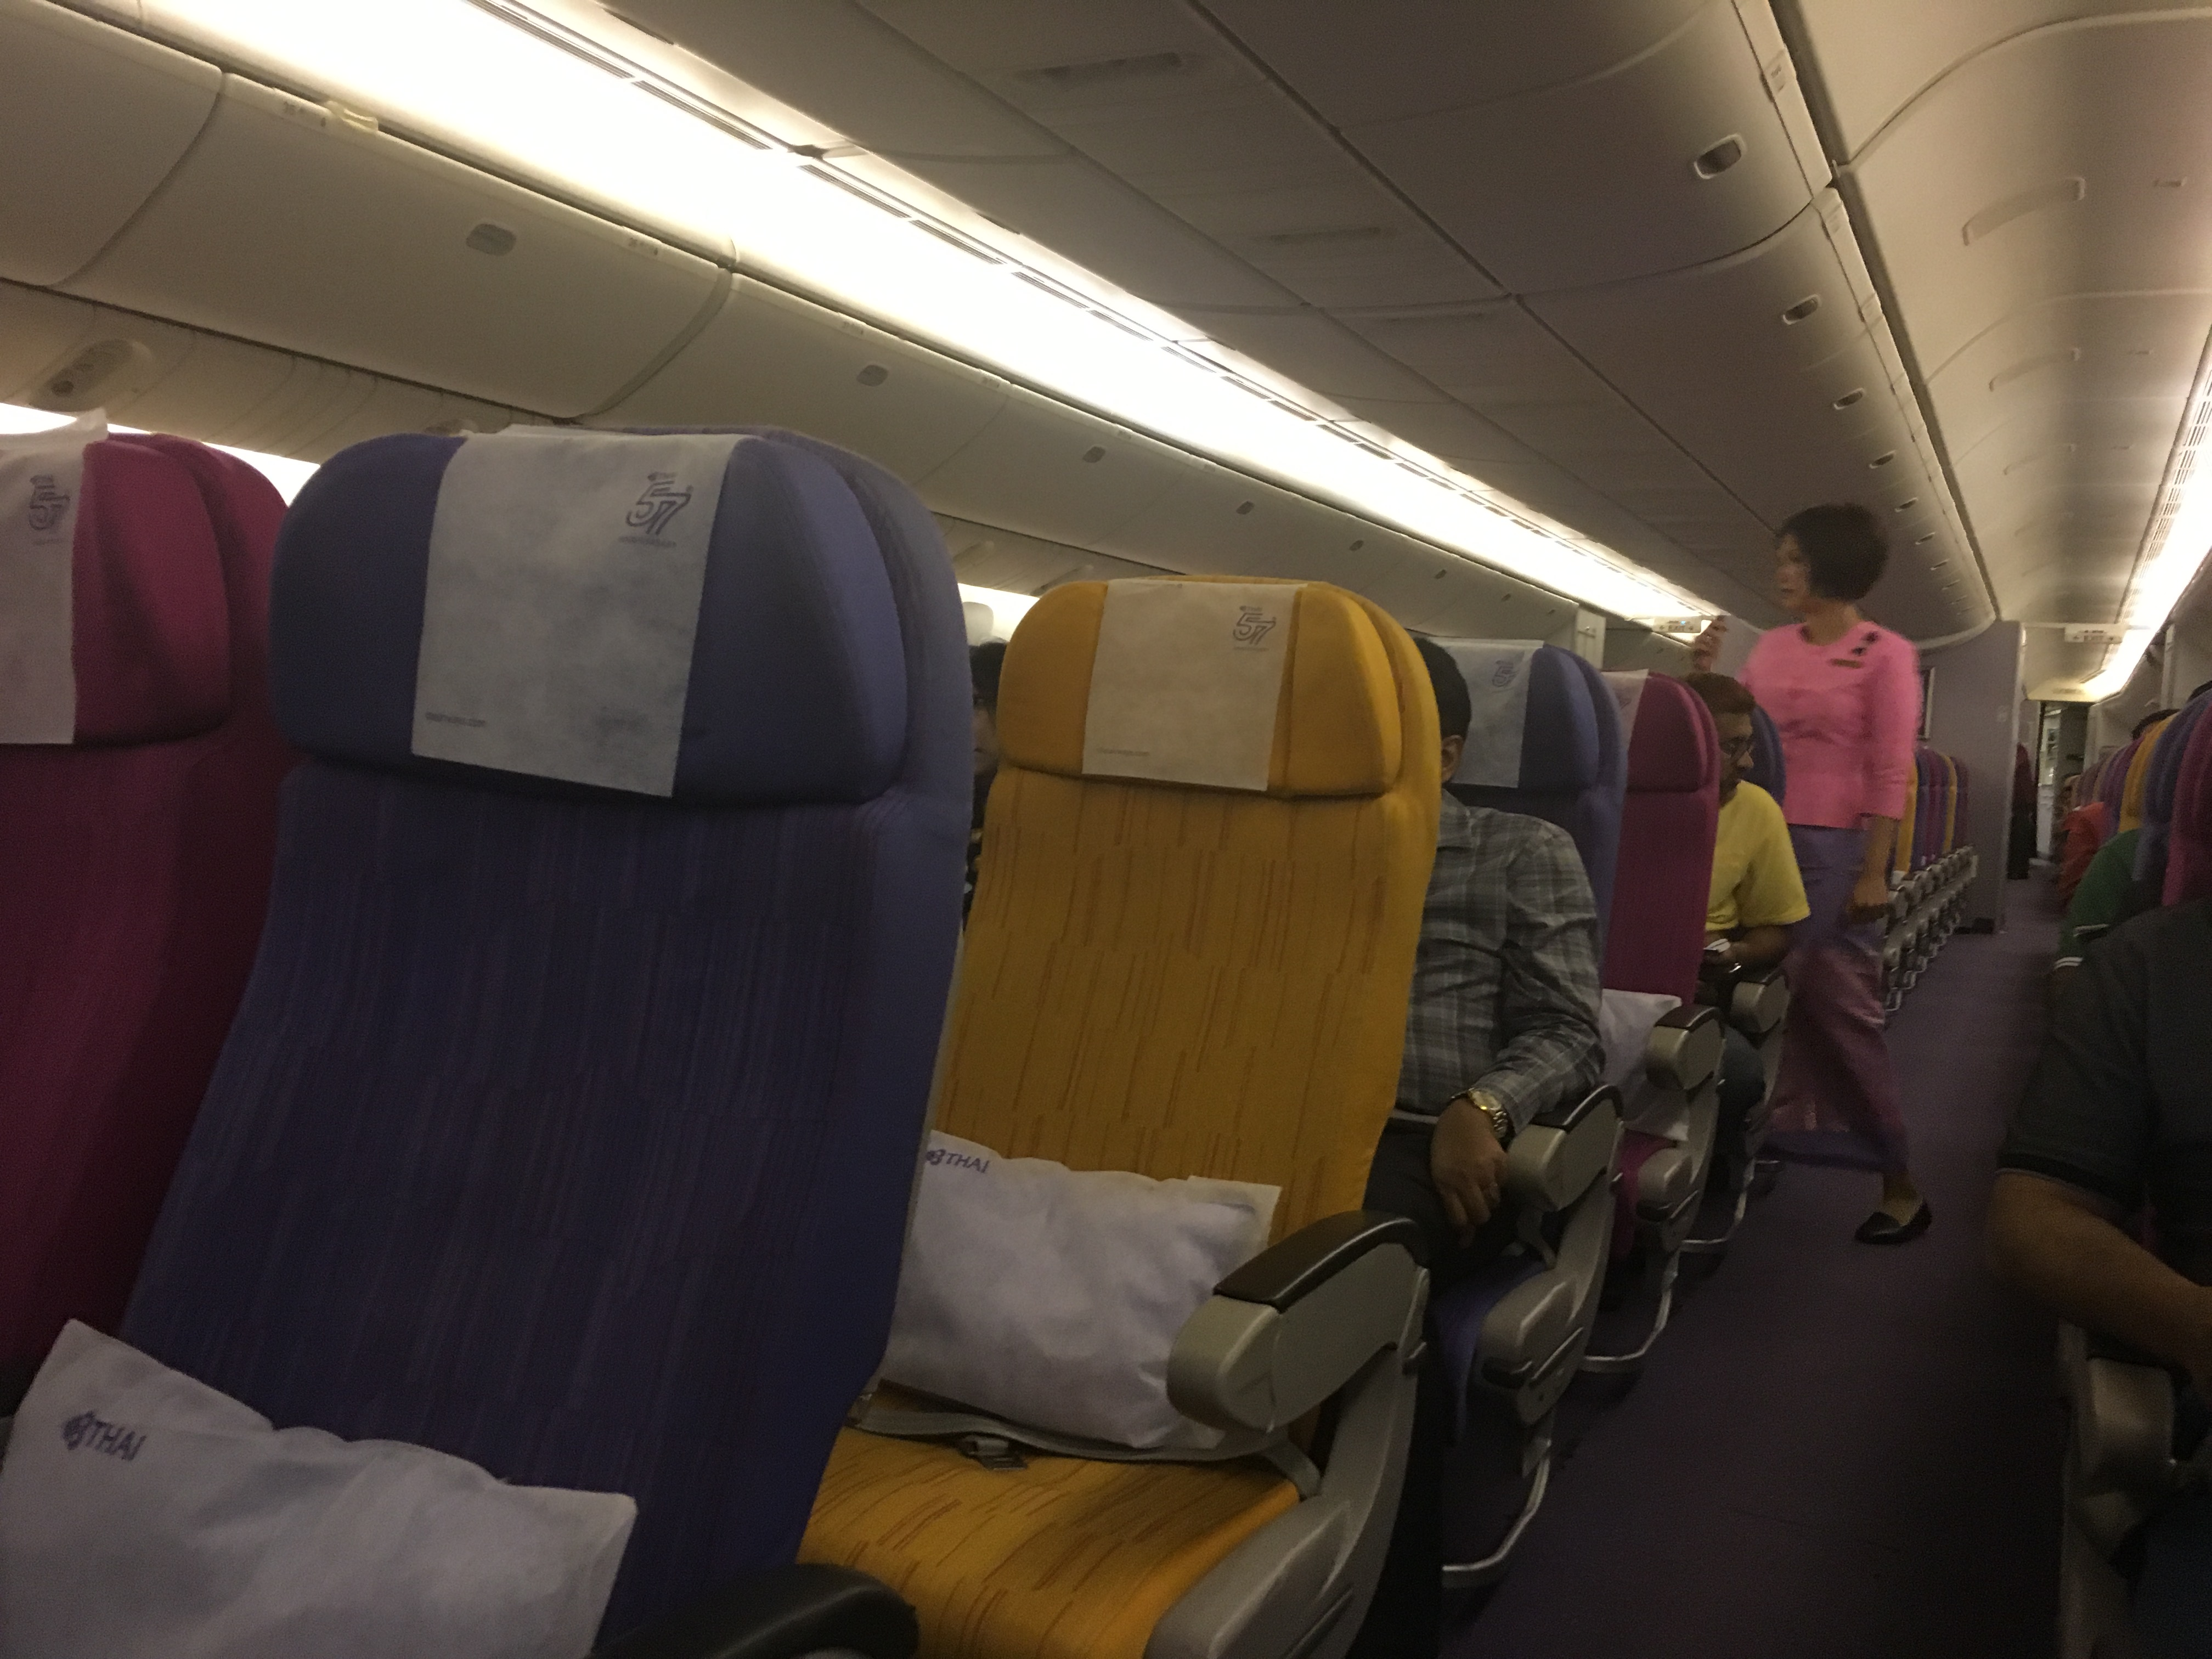 Bangkok dating sites thailand airlines